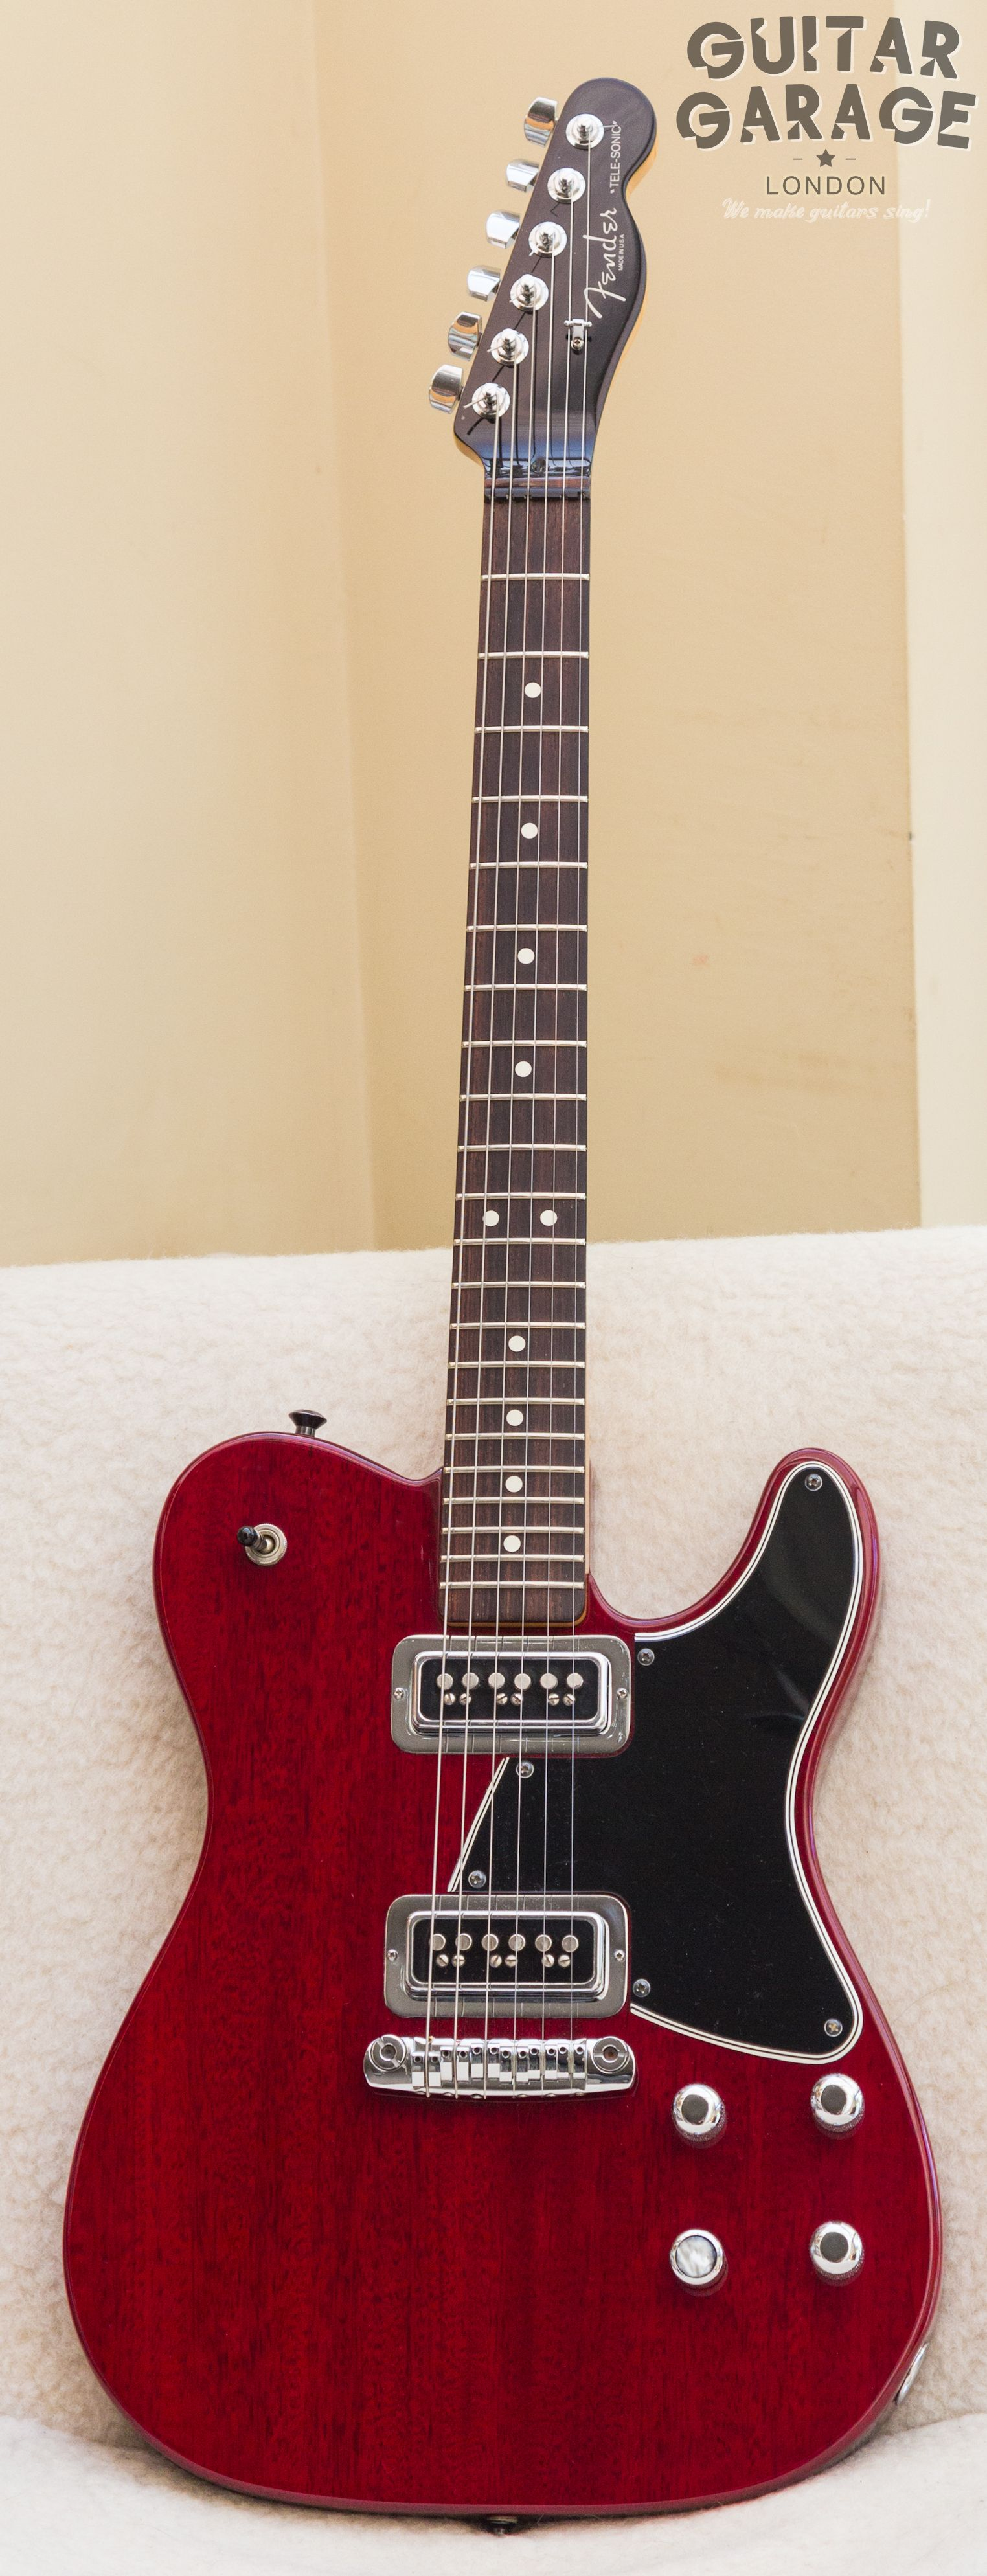 1999 Fender Telesonic. VERY RARE! With Tech-tonic fully-adjustable bridge, series/parallel wiring, 500K pots, Earvana nut, locking tuners, straplocks